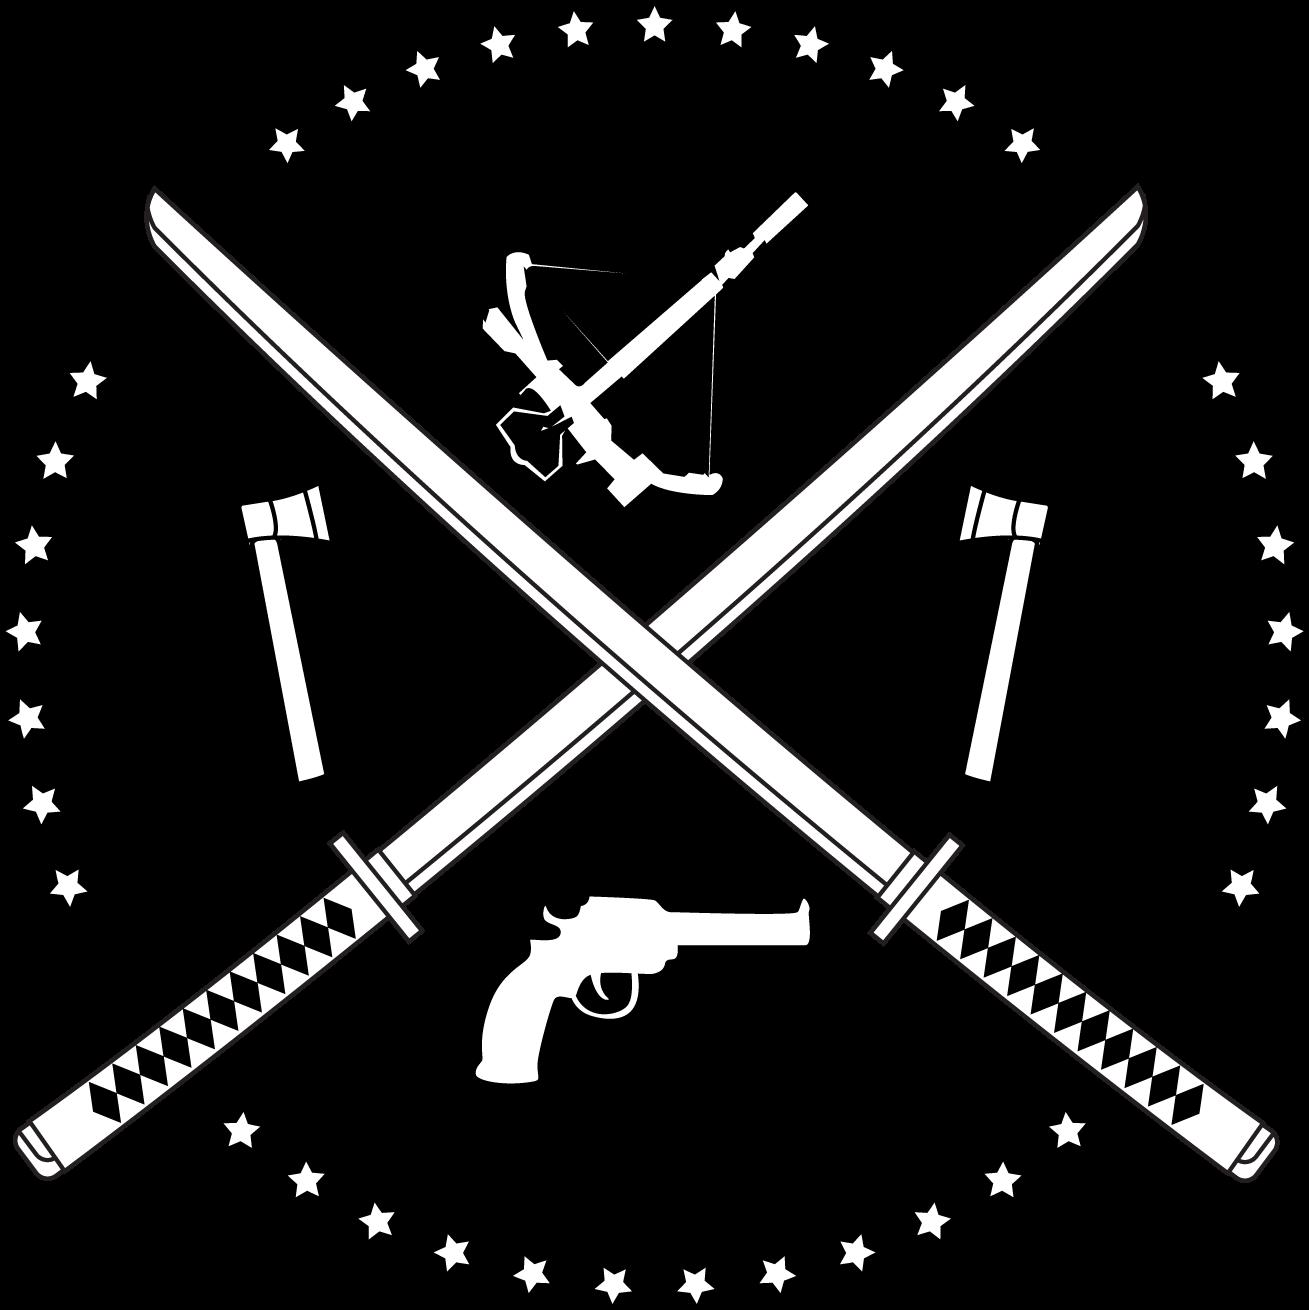 Rough TWD logo idea. : thewalkingdead.